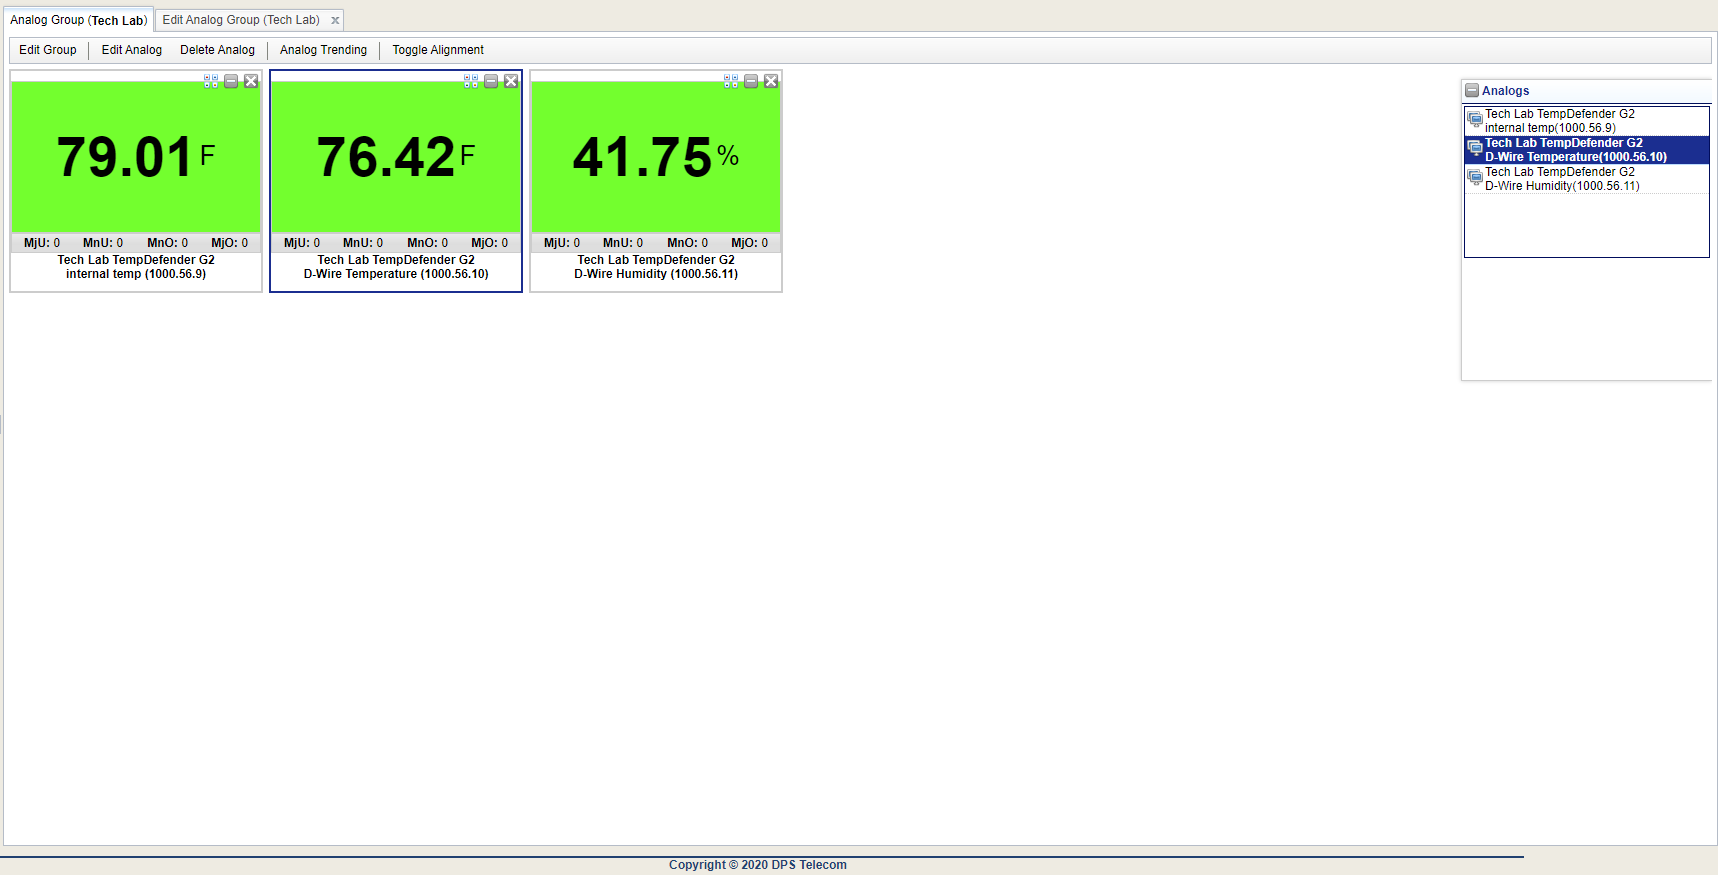 T/Mon Analog Group Configured